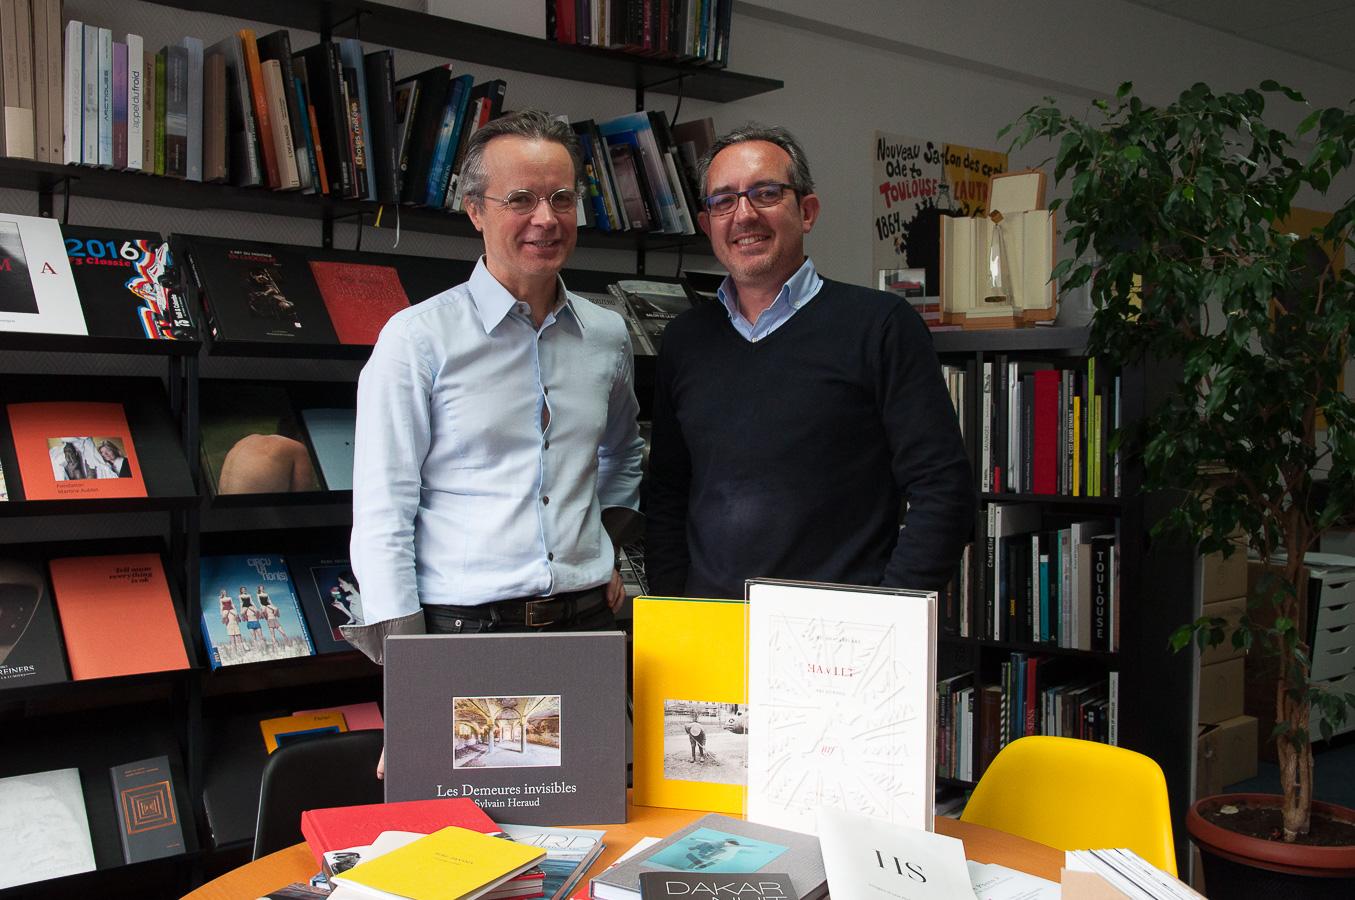 Showroom de l'imprimerie Escourbiac à Paris - Alain Escourbiac (gauche) et John Briens (droite)